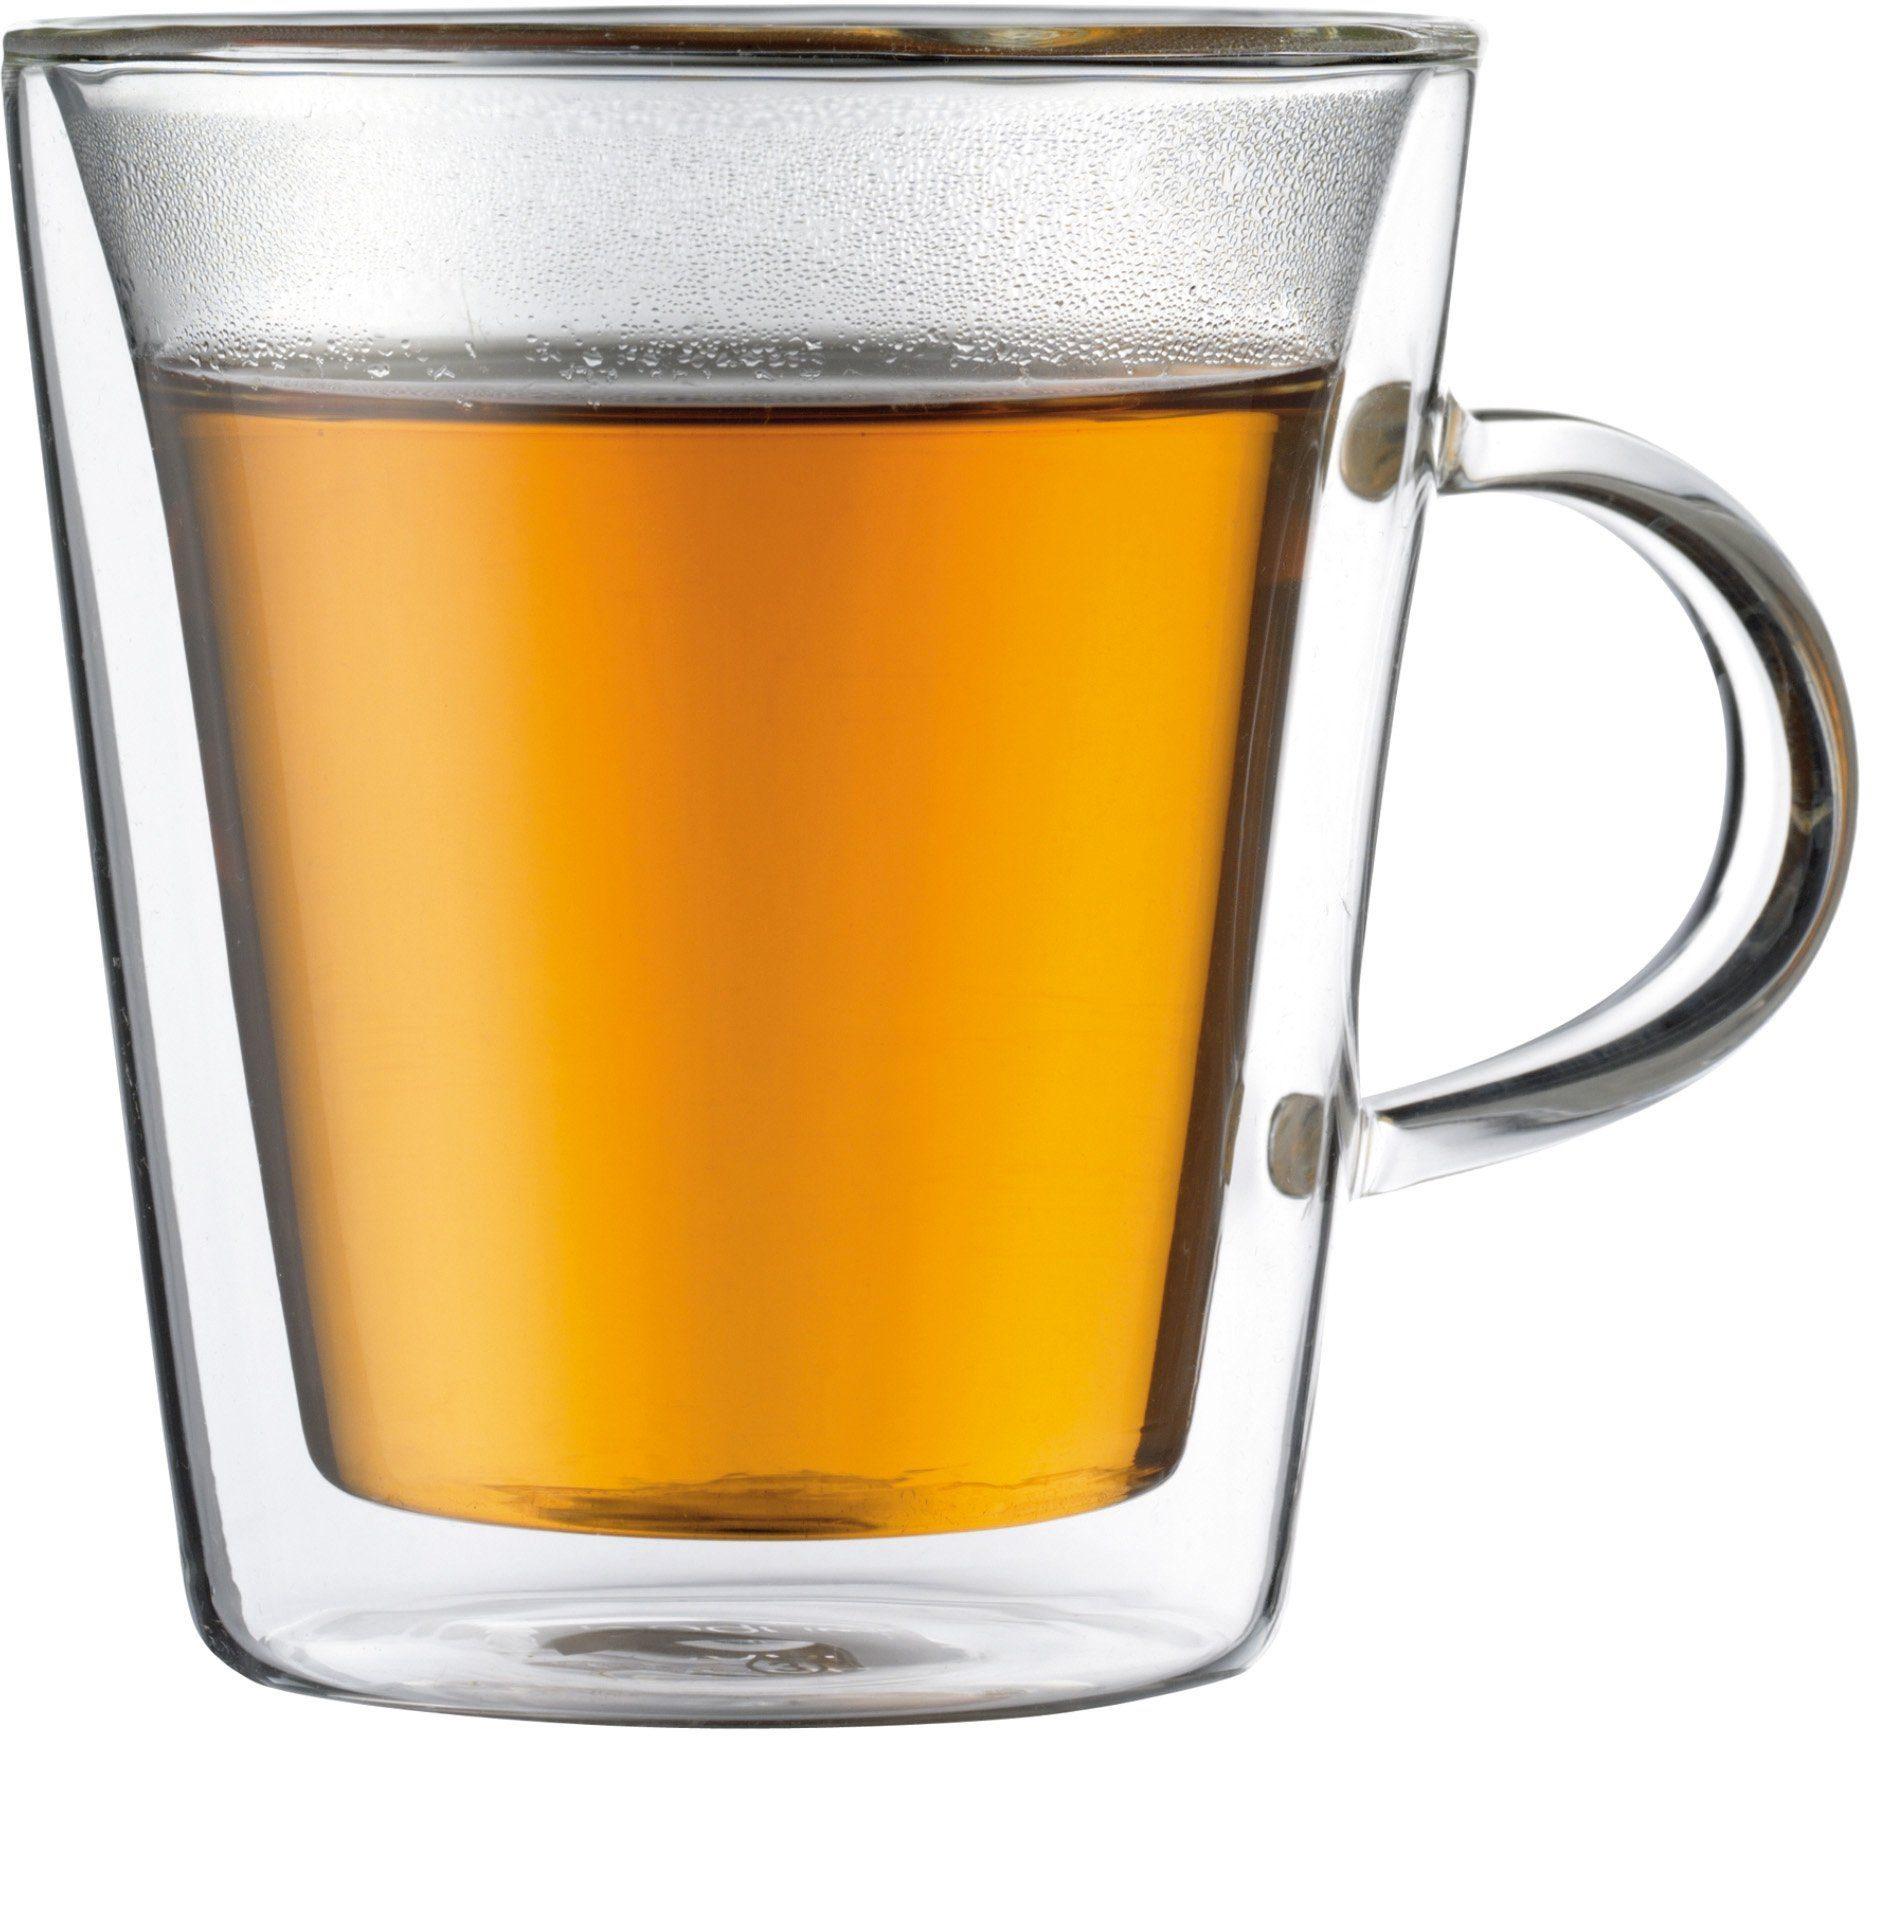 bodum® Tasse, doppelwandig, 2 Stück, 0,2 l